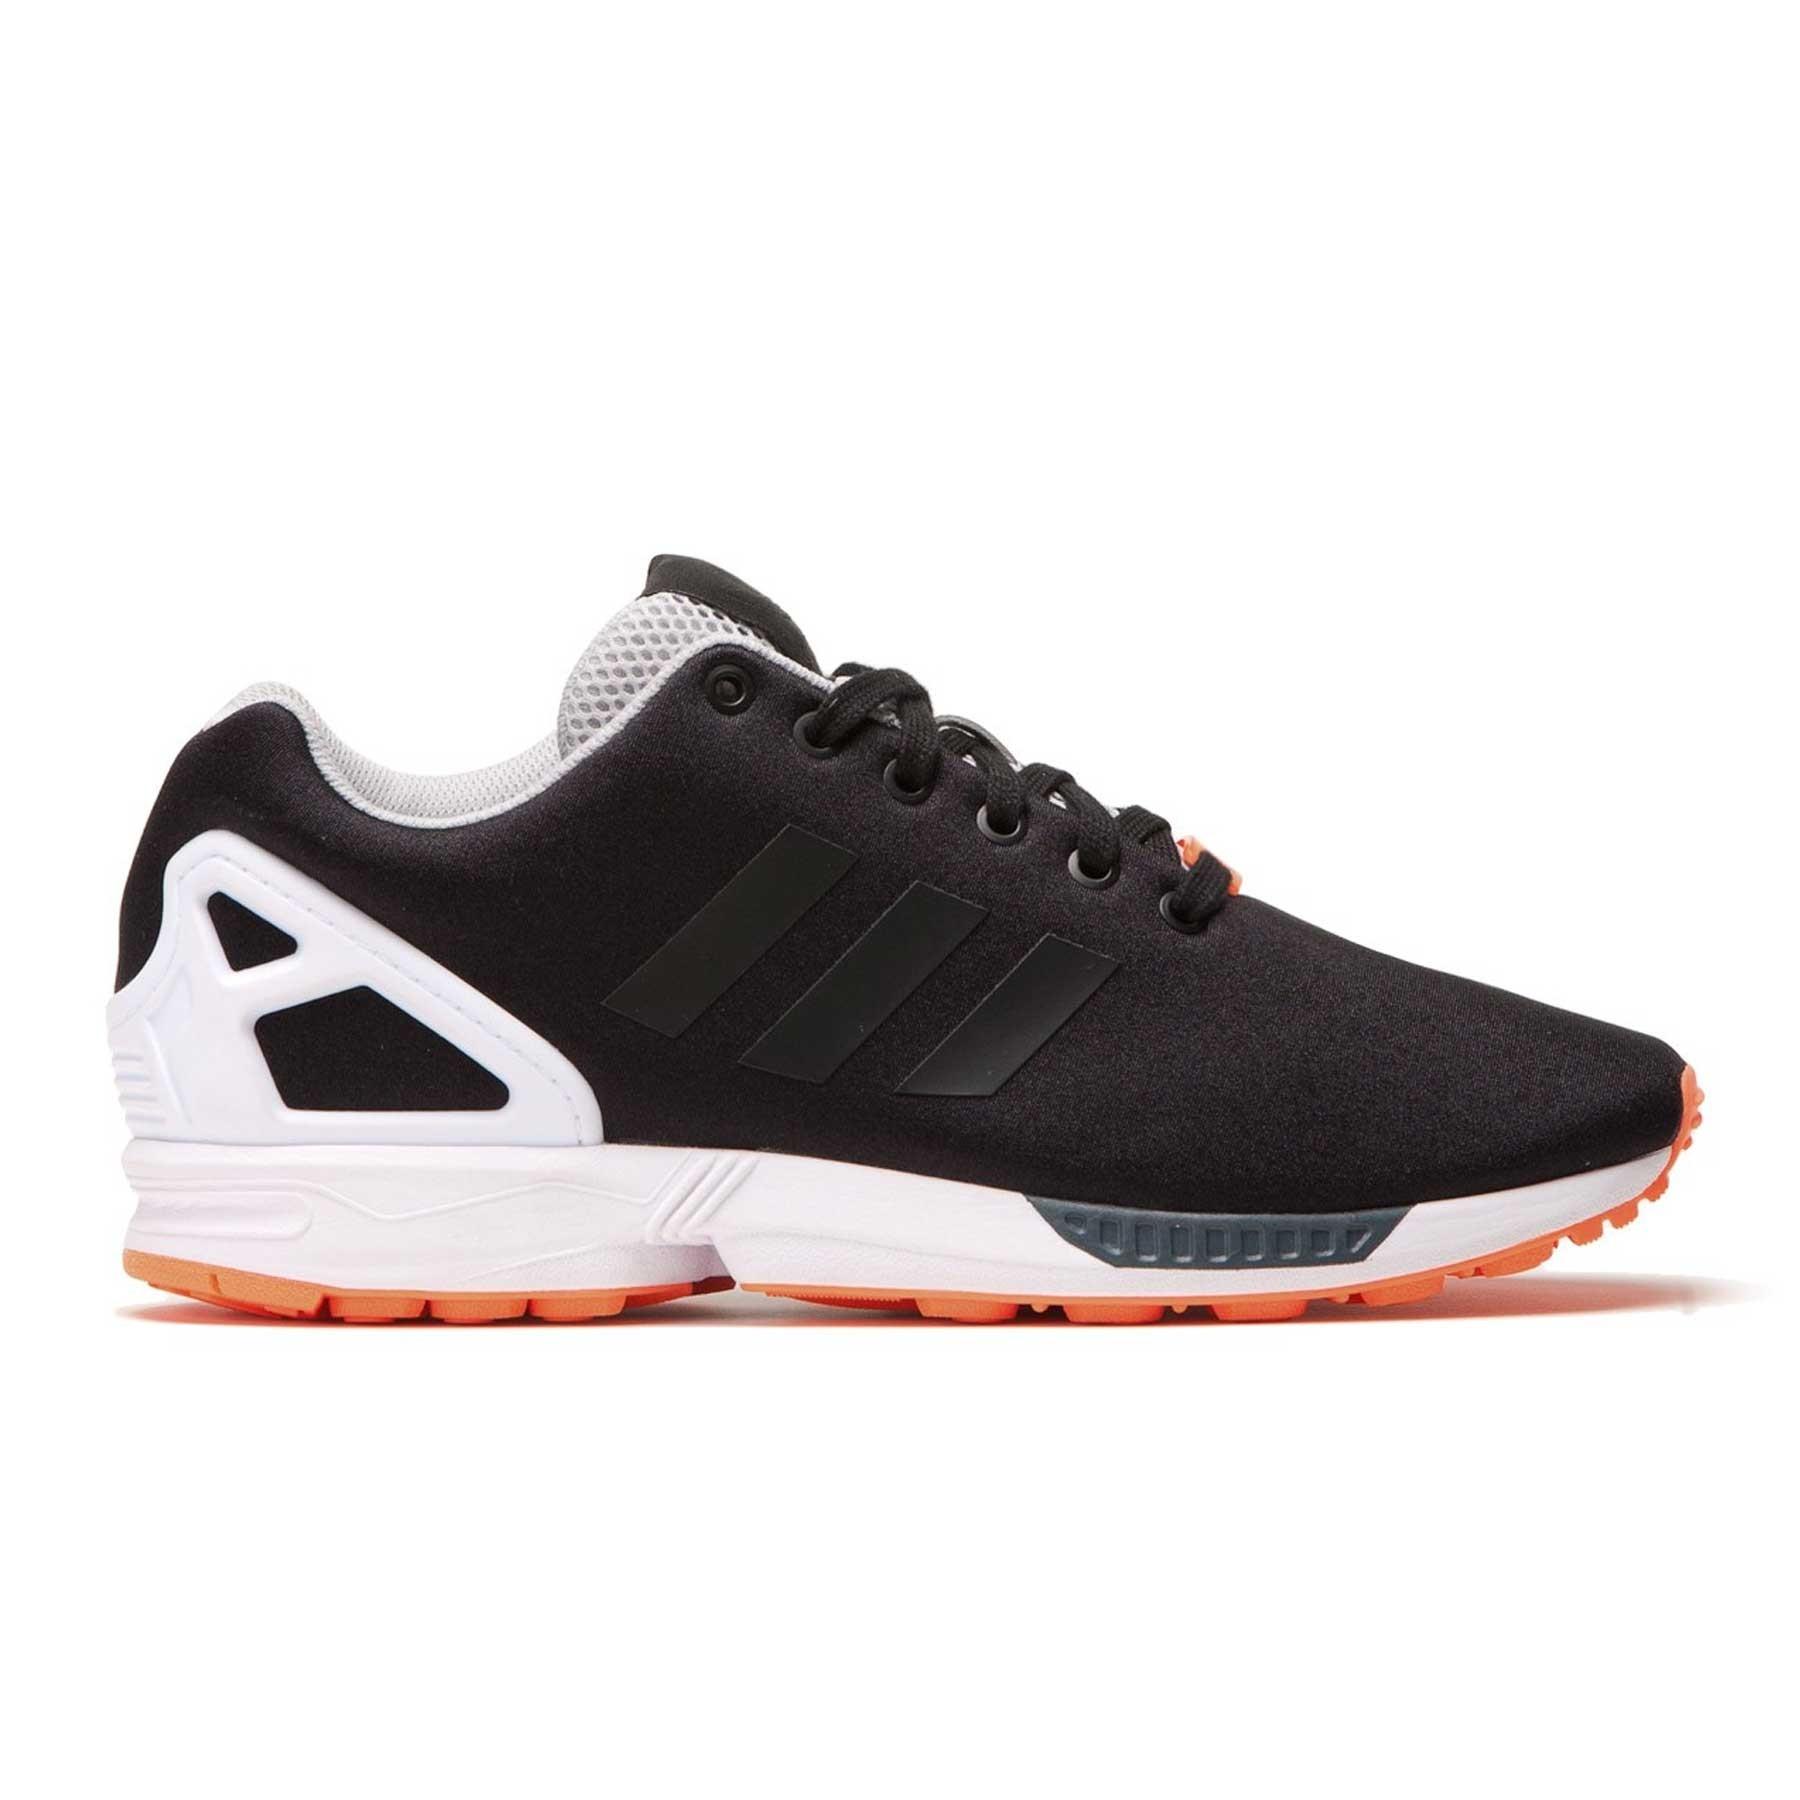 adidas zx flux nere e arancio